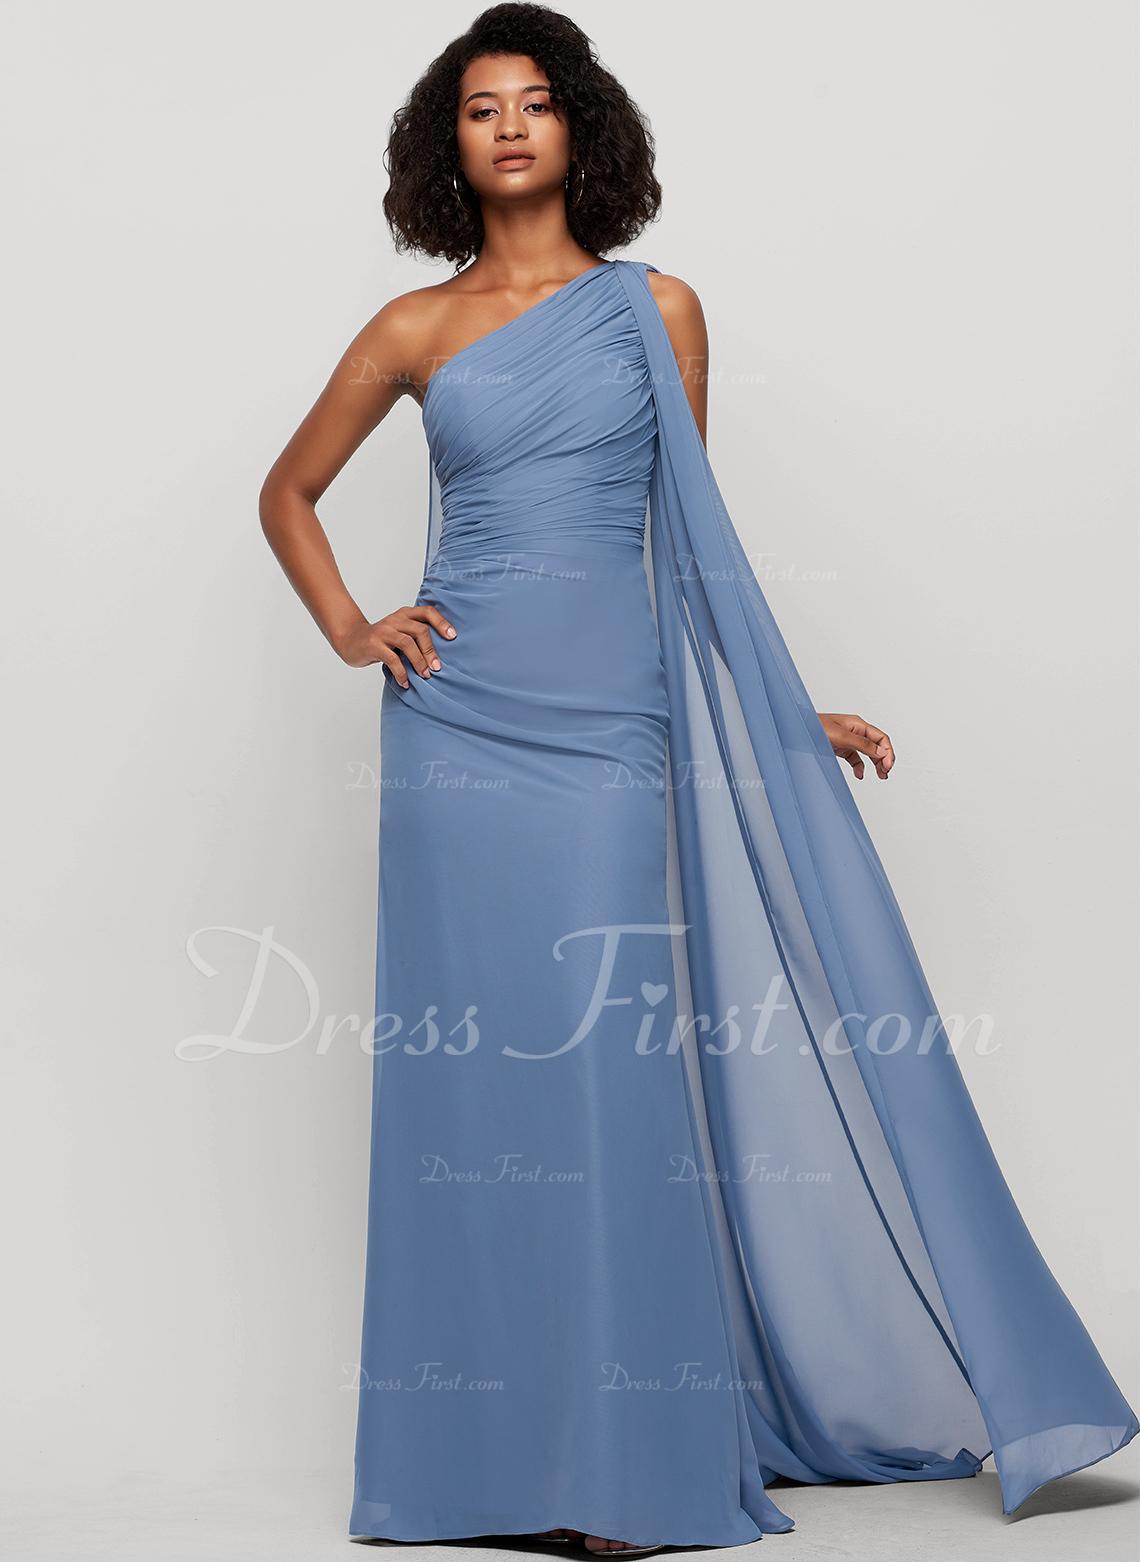 Sheath/Column One-Shoulder Floor-Length Chiffon Evening Dress With Ruffle